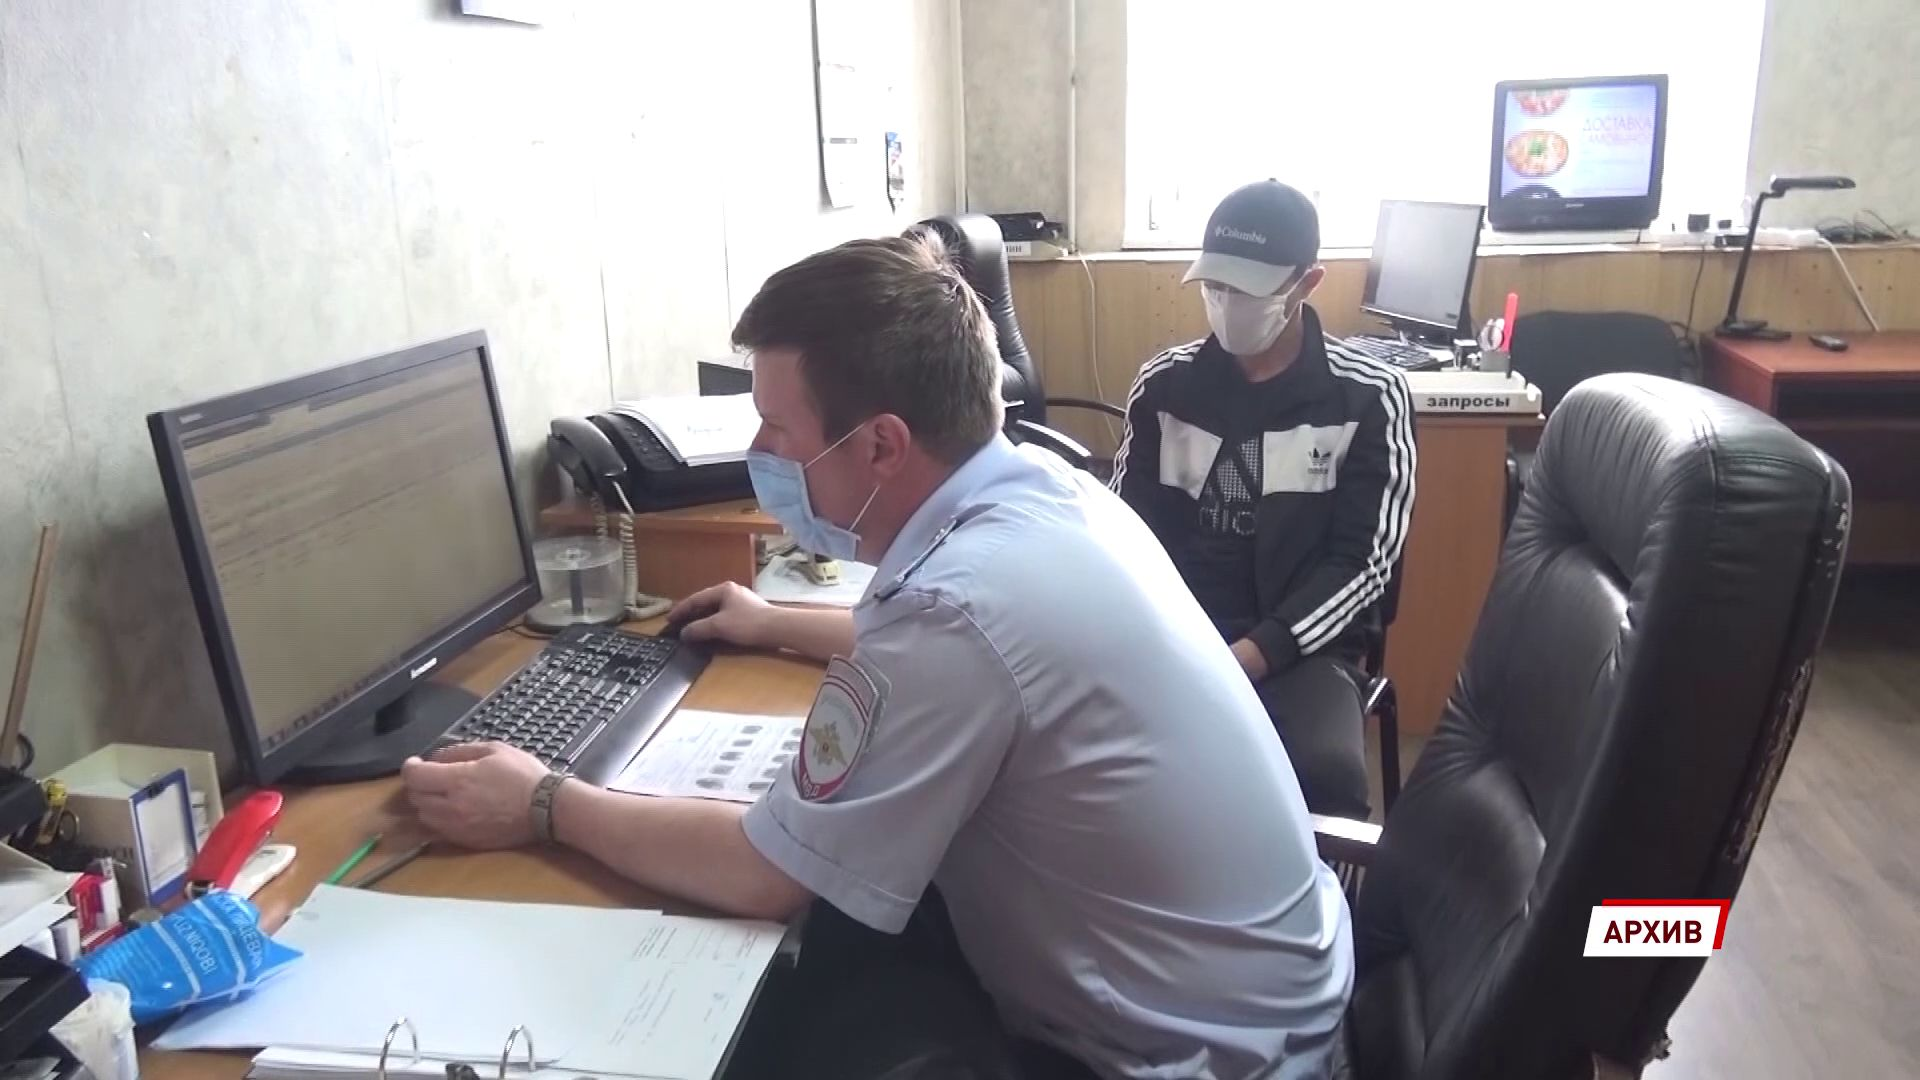 Ярославца, сбившего 82-летнюю пенсионерку, ждет суд